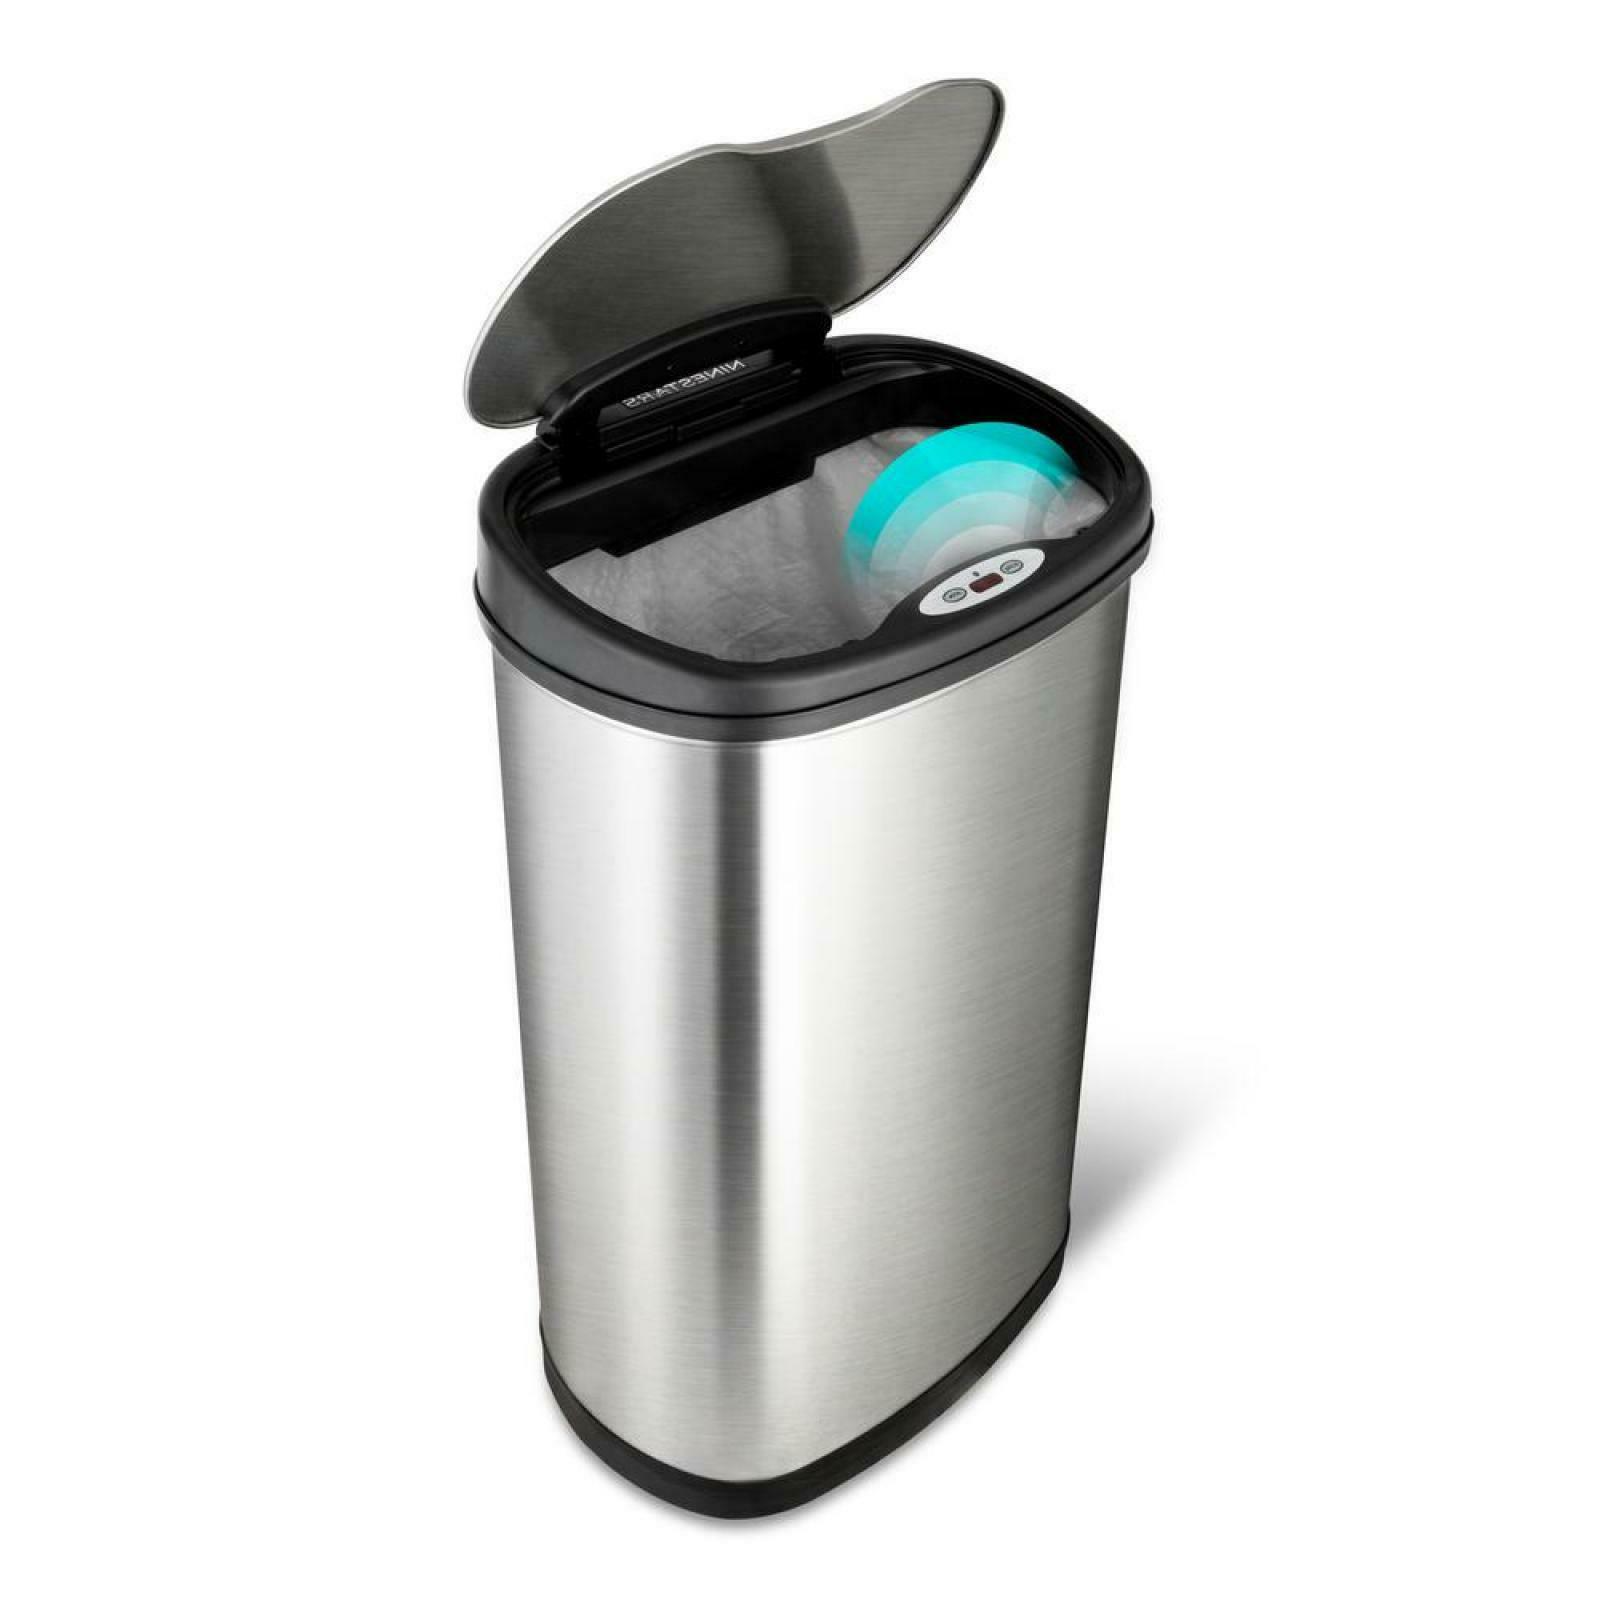 stainless steel oval sensored trash